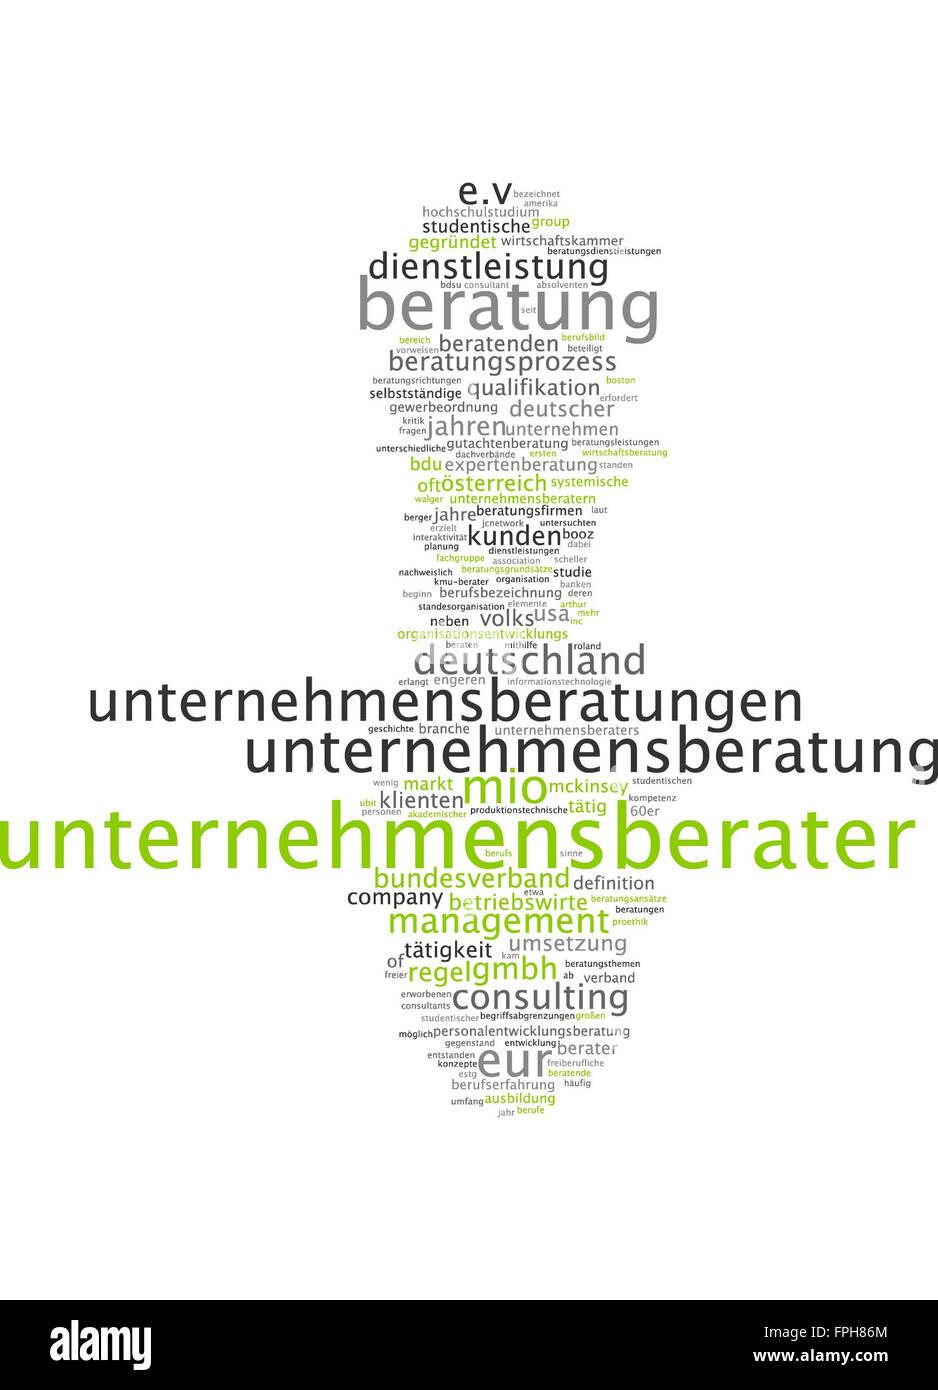 Unternehmensberatungen Stock Photos & Unternehmensberatungen Stock ...